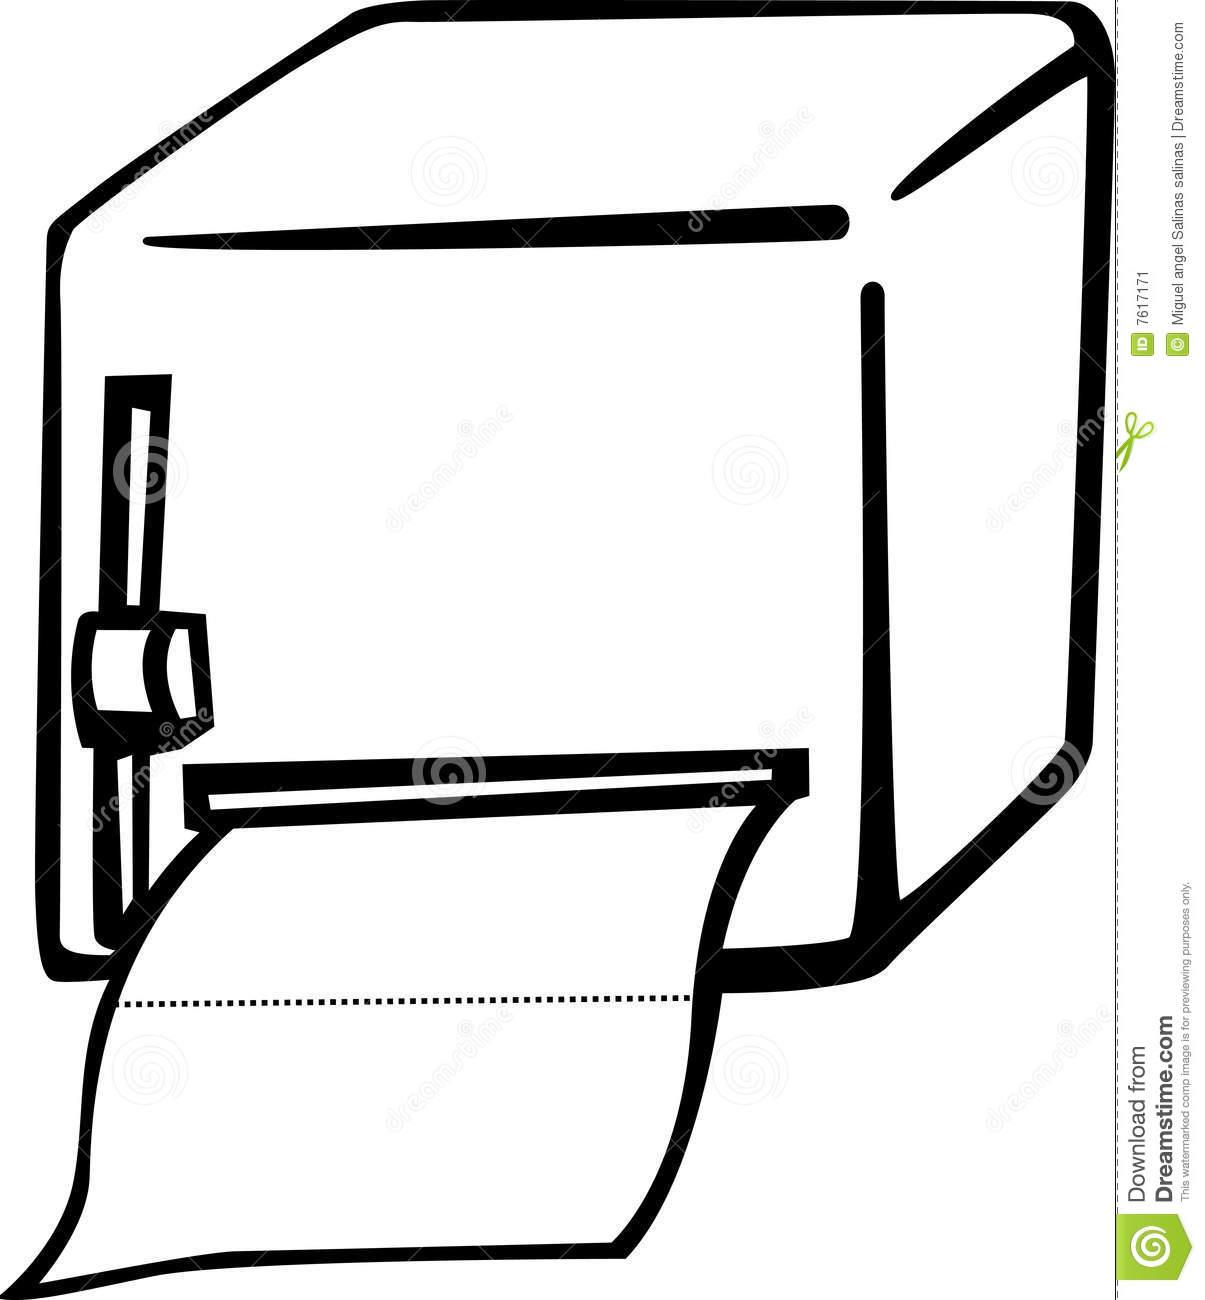 Dispenser Clipart